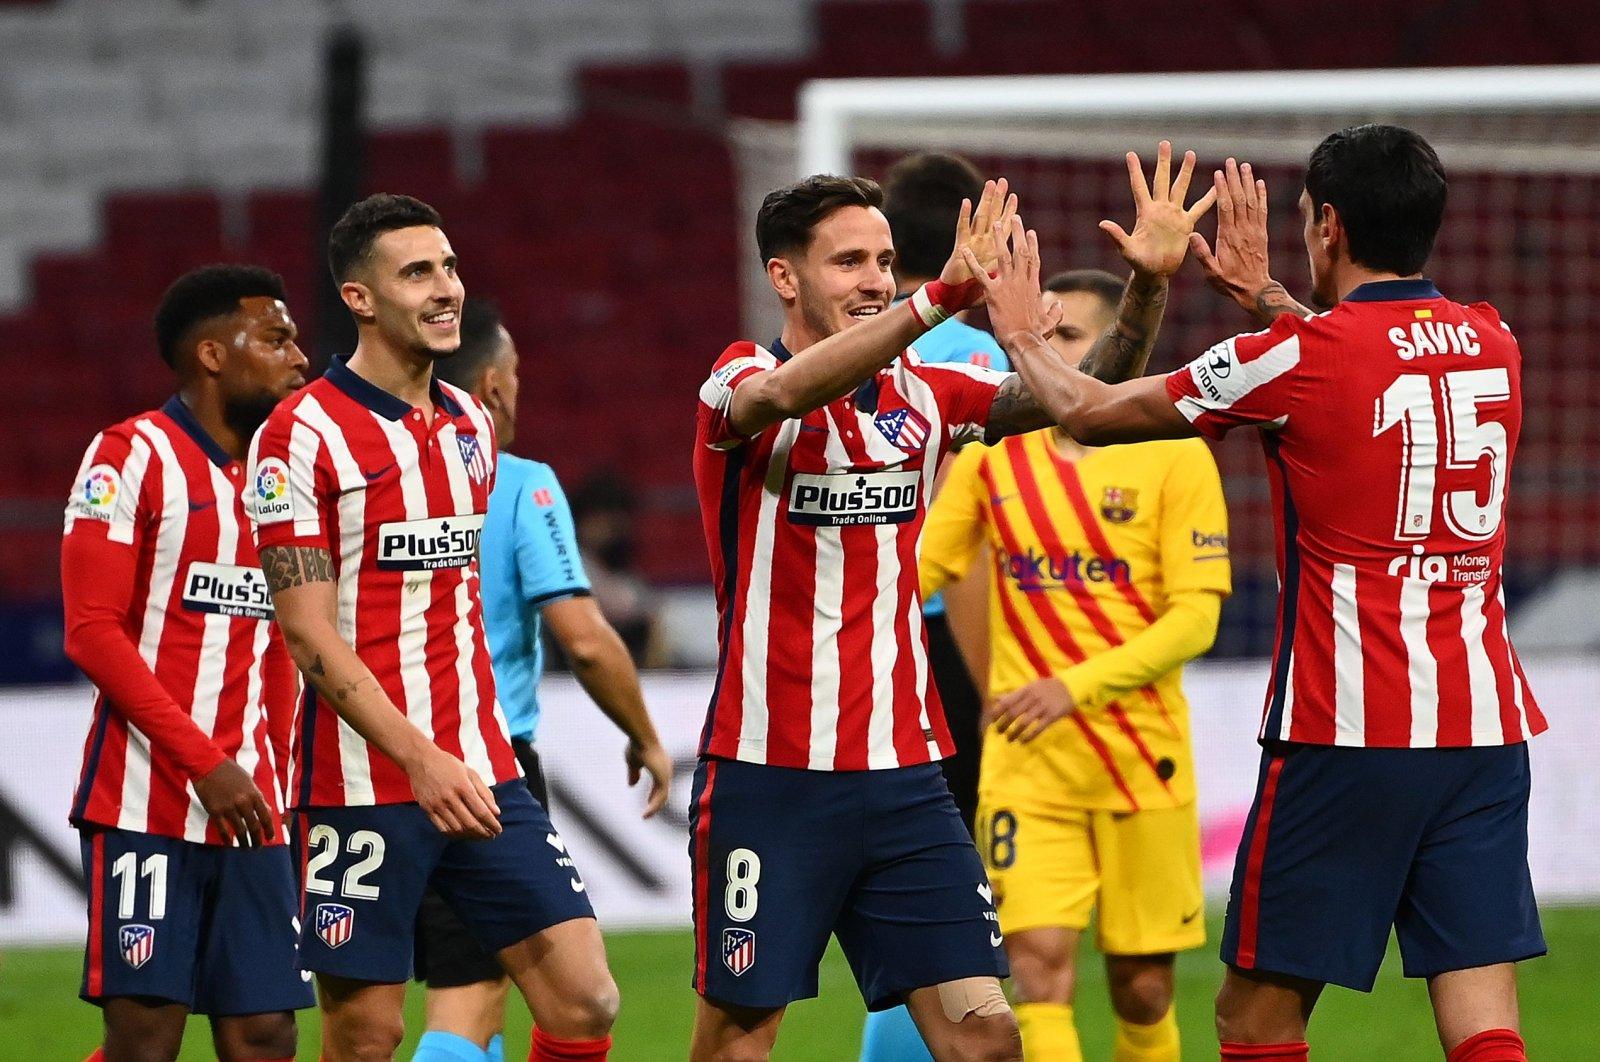 Atletico Madrid players celebrate winning a La Liga match against Barcelona, in Madrid, Spain, Nov. 21, 2020. (AFP Photo)